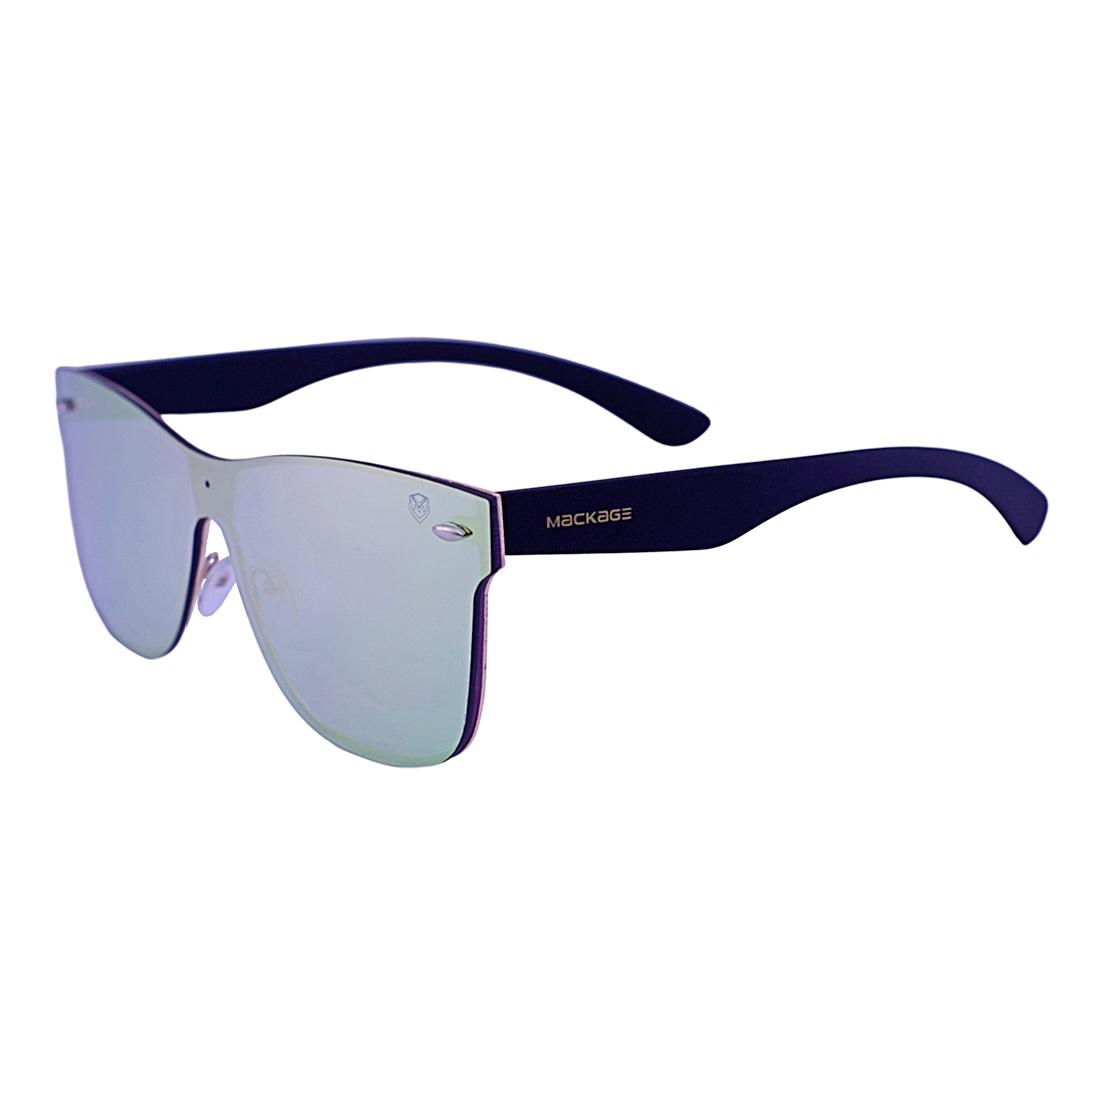 Óculos De Sol Mackage Unisex Acetato Newwayfarer Mascara - Preto Lente Furtacor